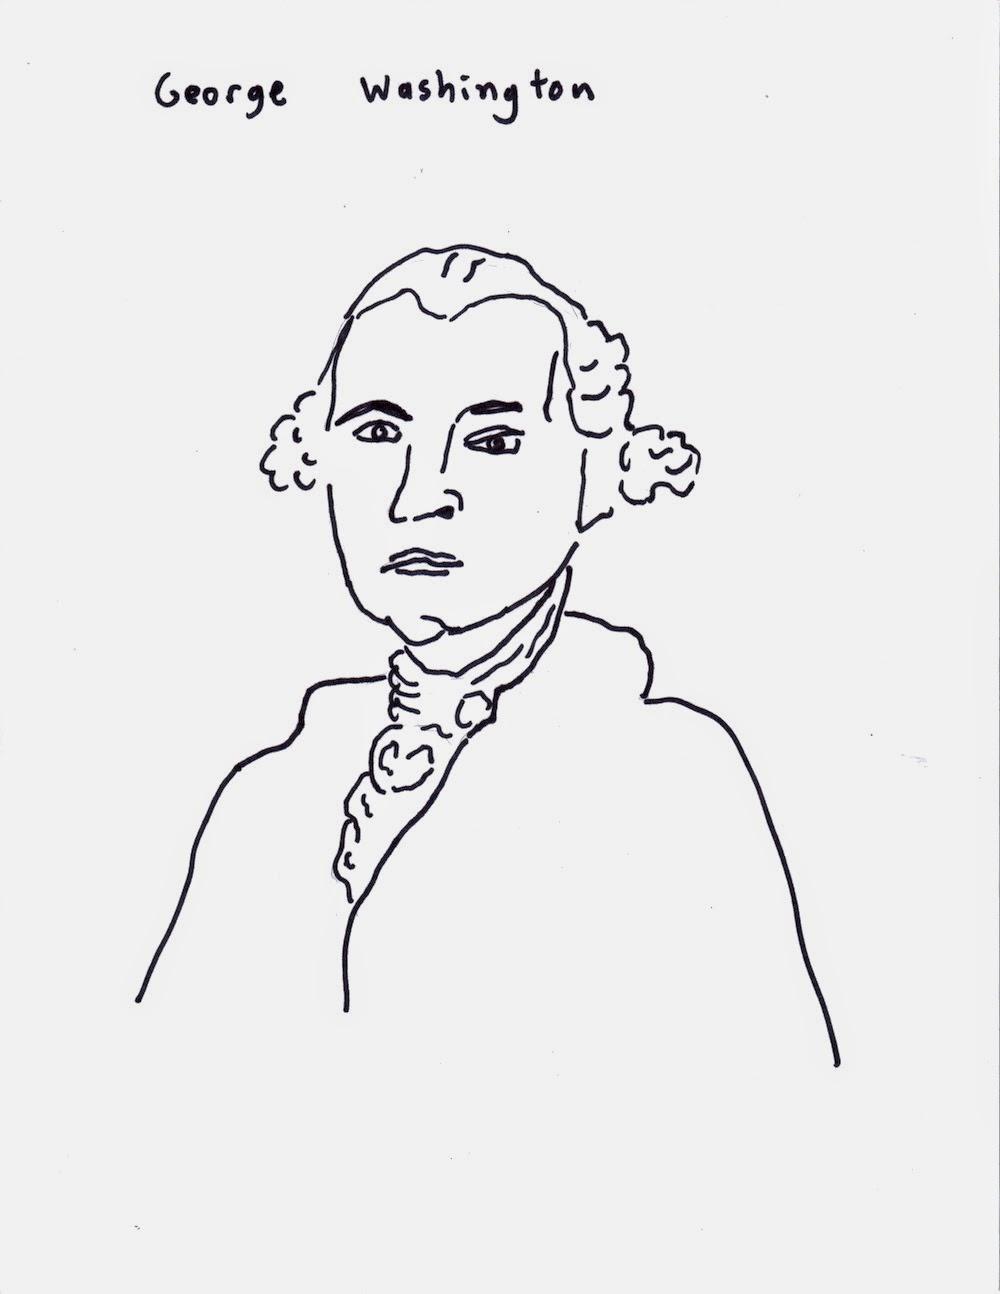 Jesse's Blog: The American Presidents: George Washington